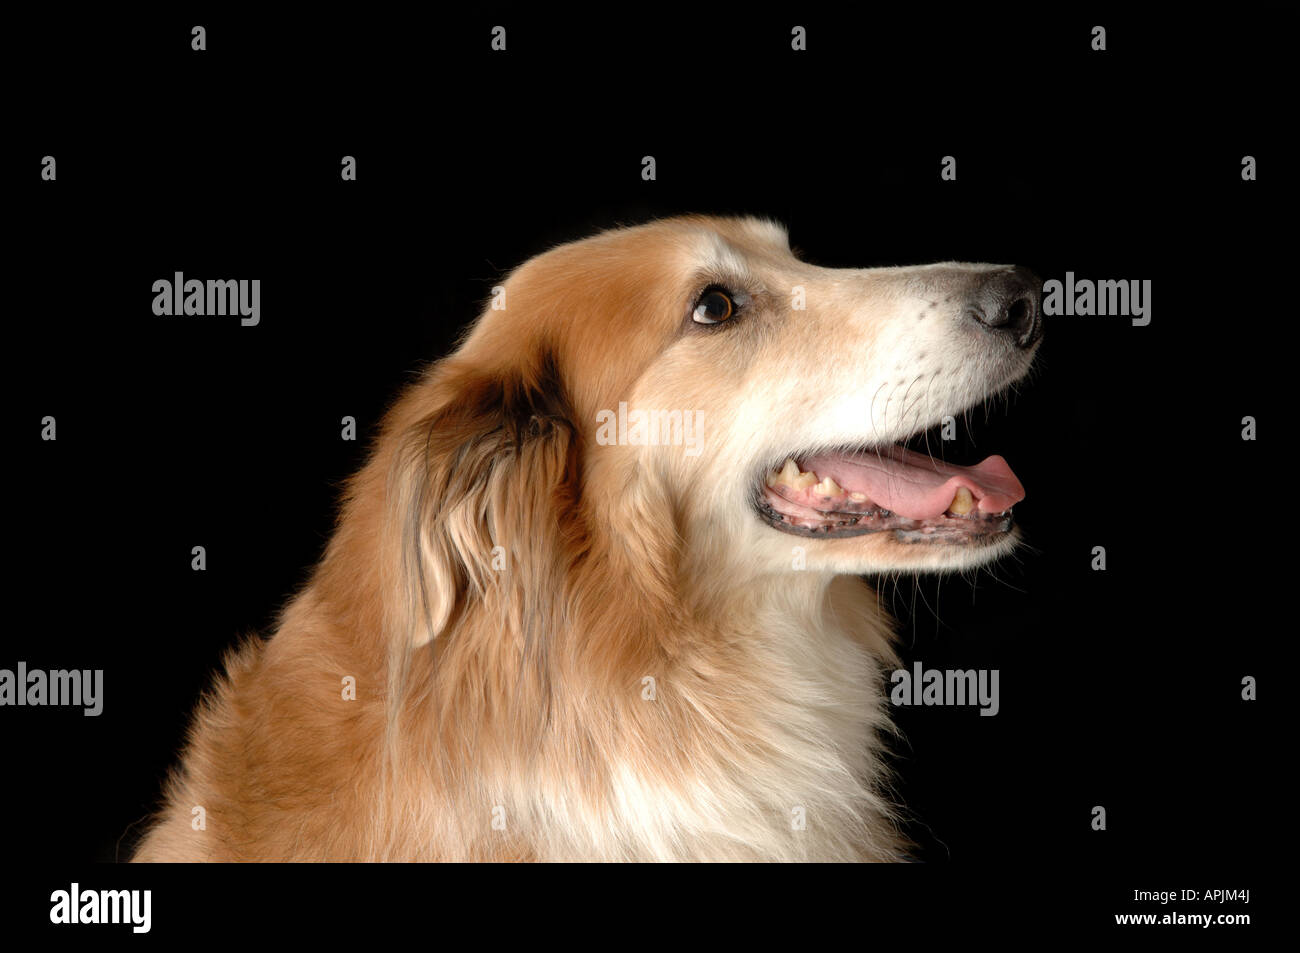 Collie dog - Stock Image